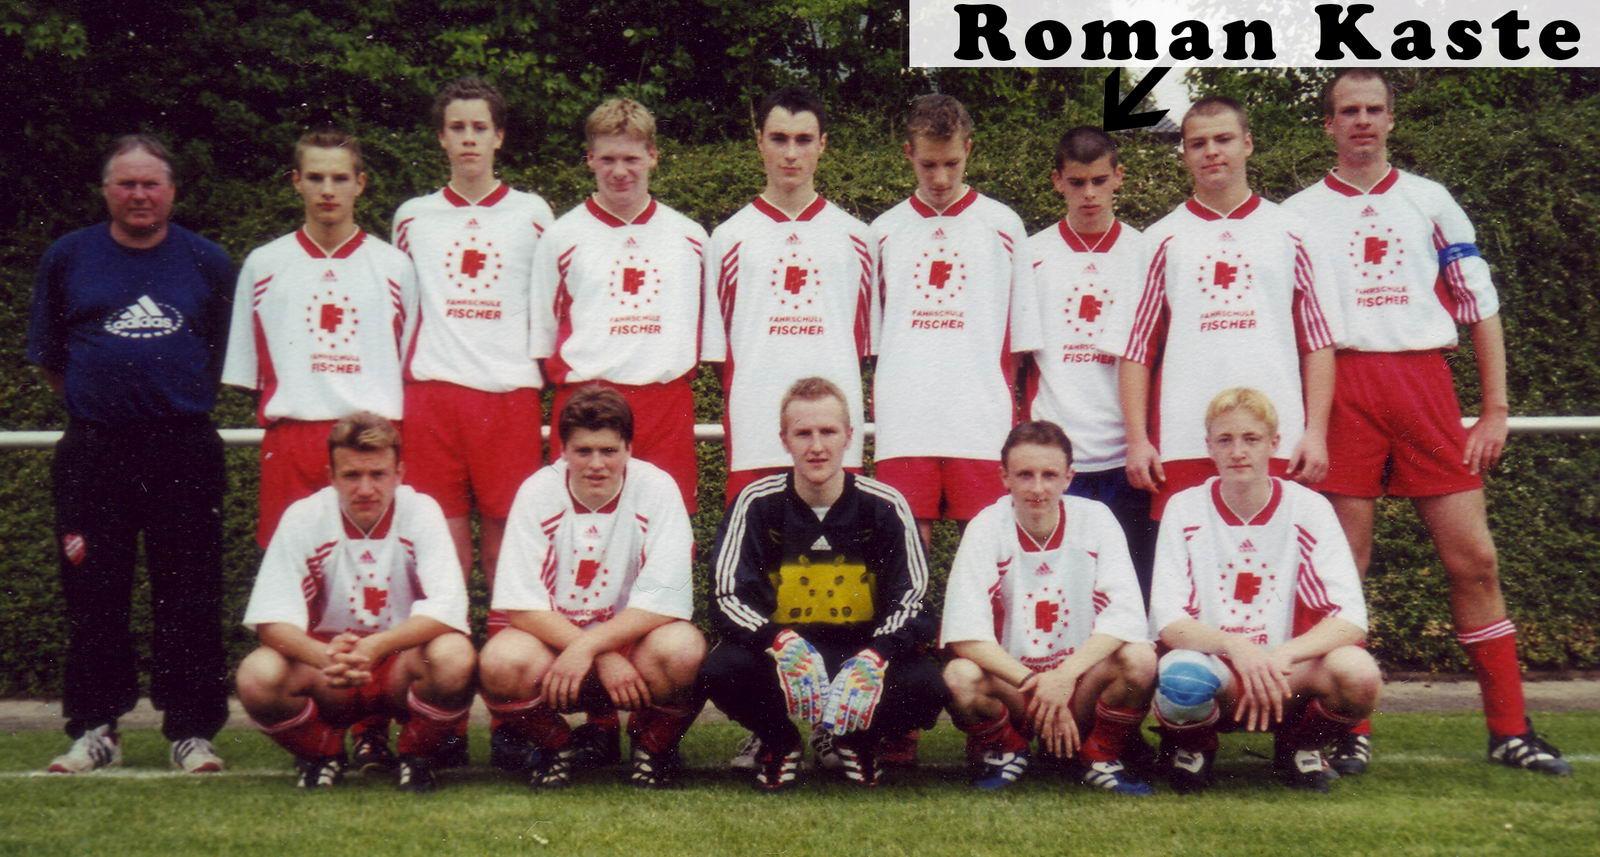 A-Jugend 2001 Legende Ulf Sievers ist Trainer